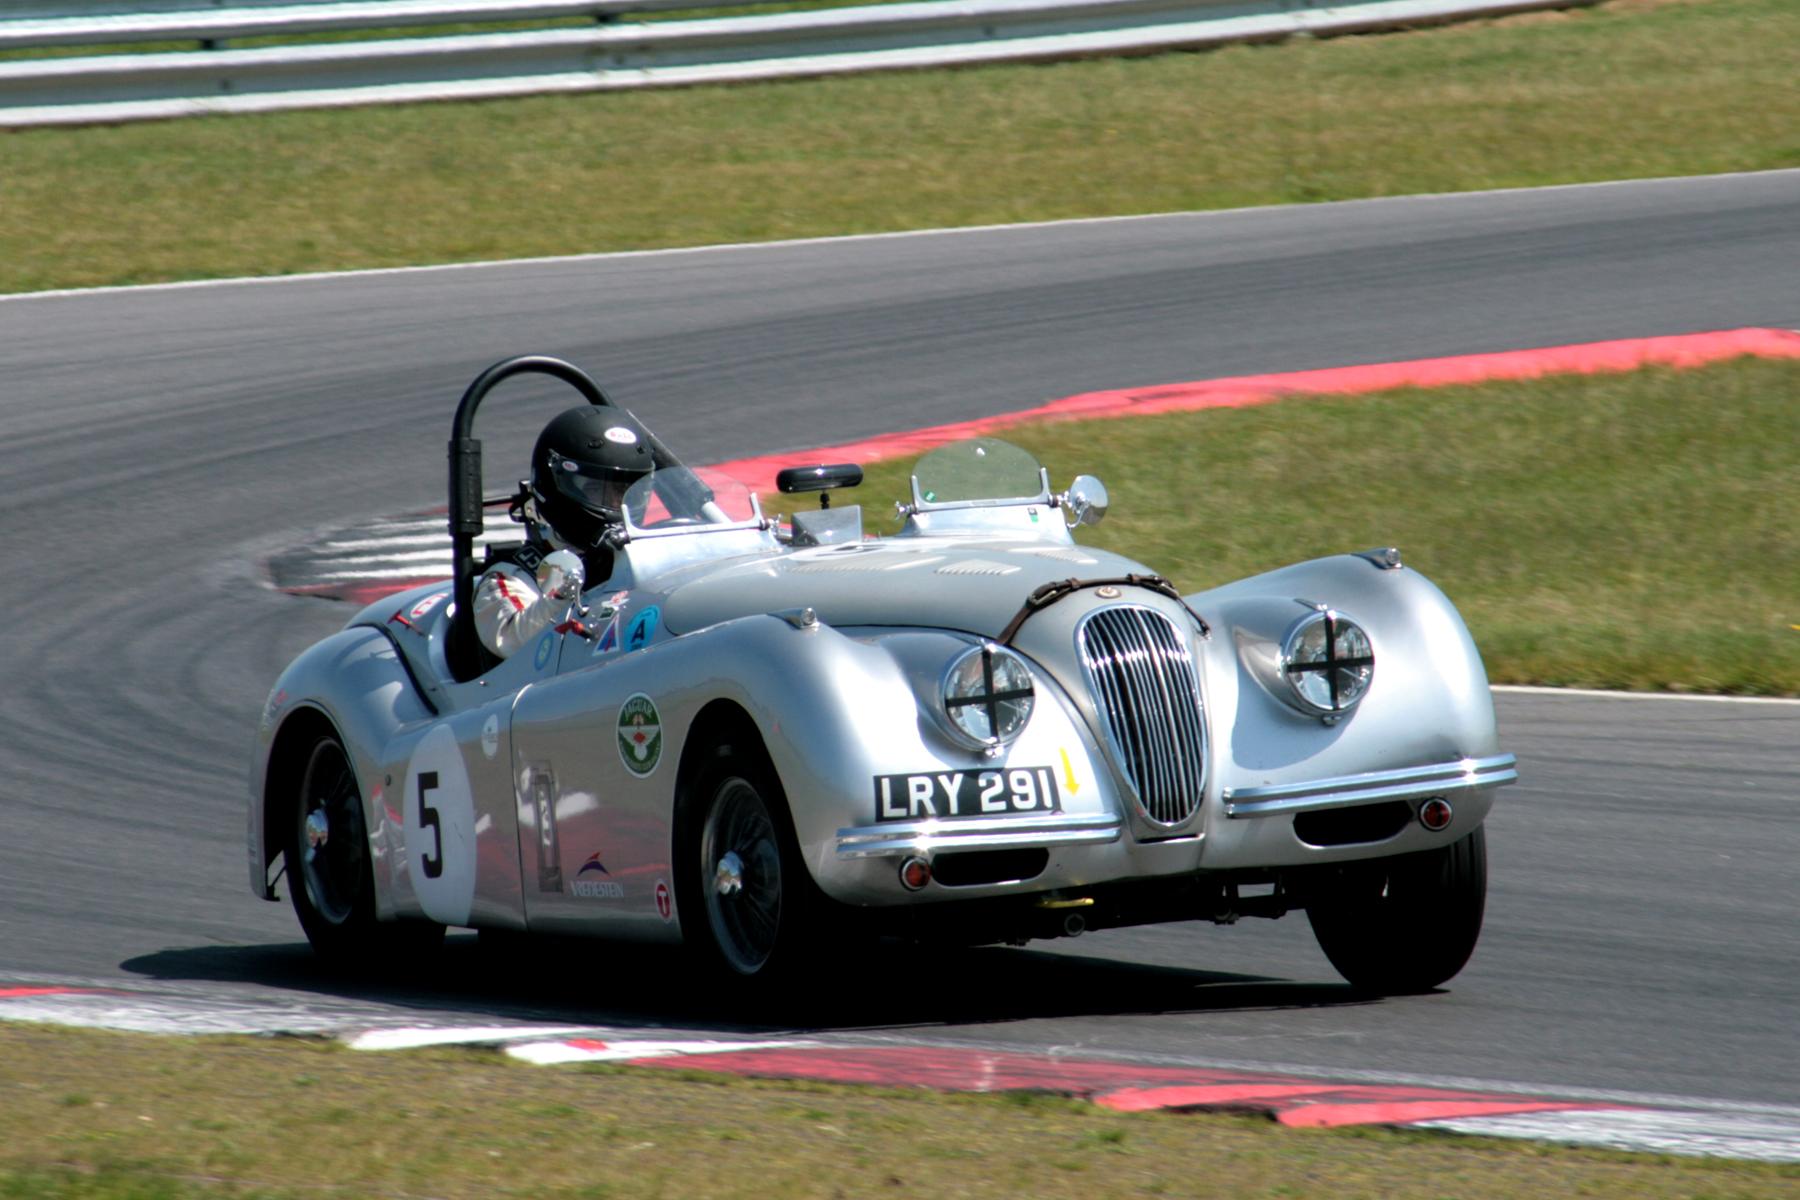 Andrew Wenman exits Murrays in his Jaguar XK 120  Photo - John Turner